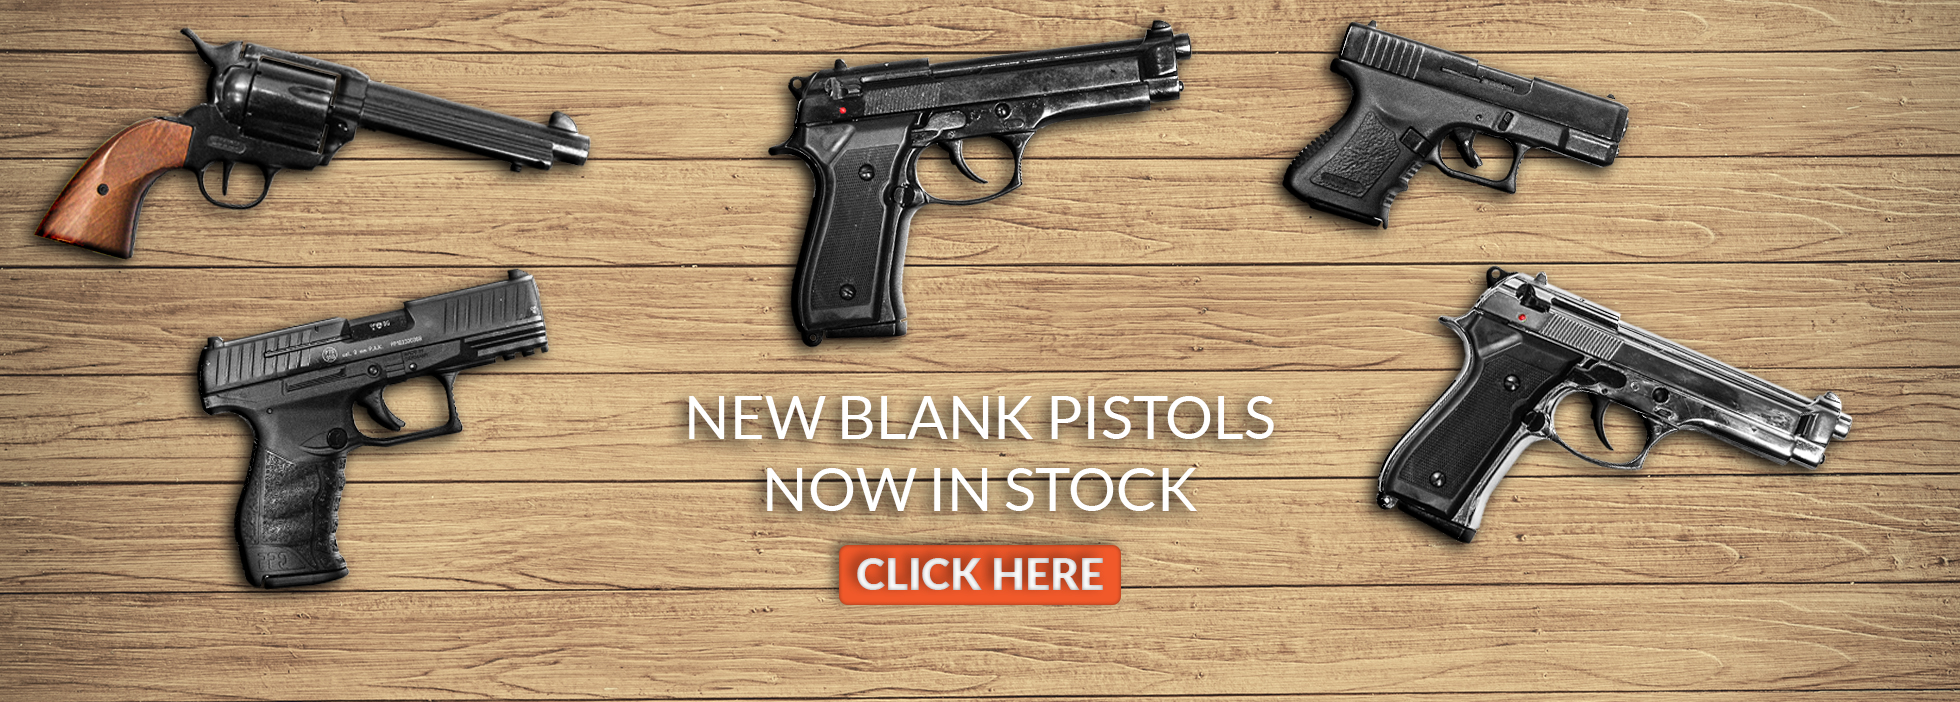 Blank Pistols